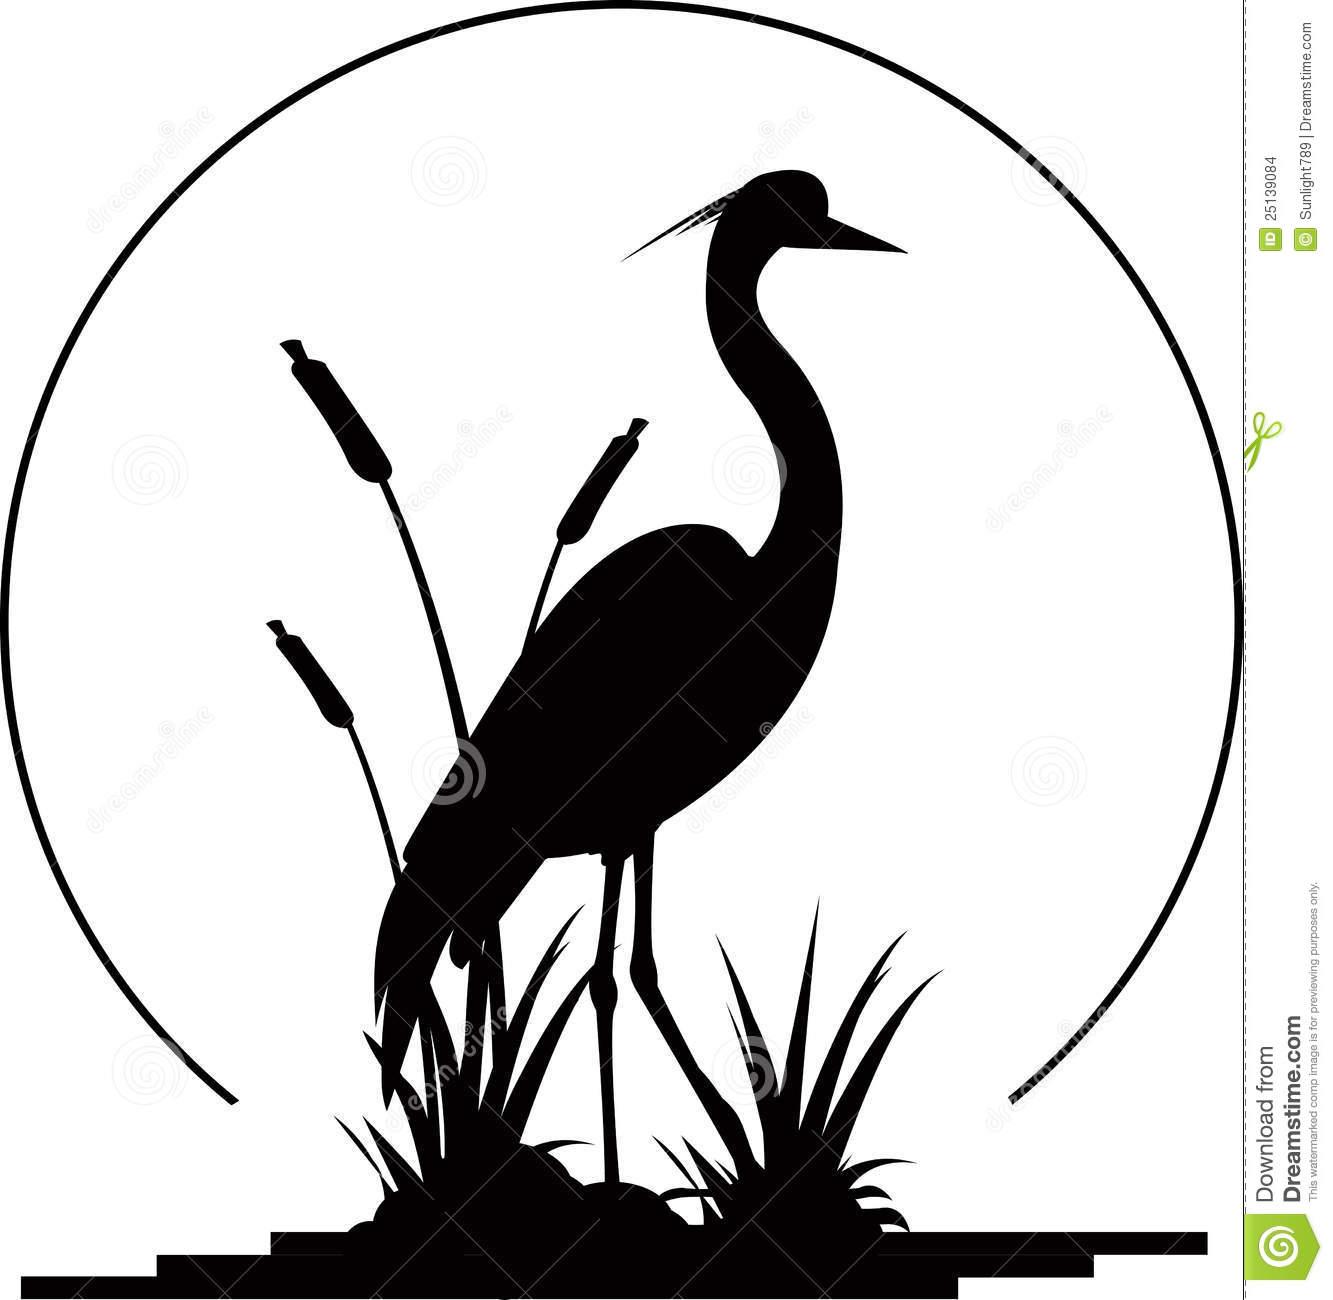 1333x1300 Heron Clipart Silhouette